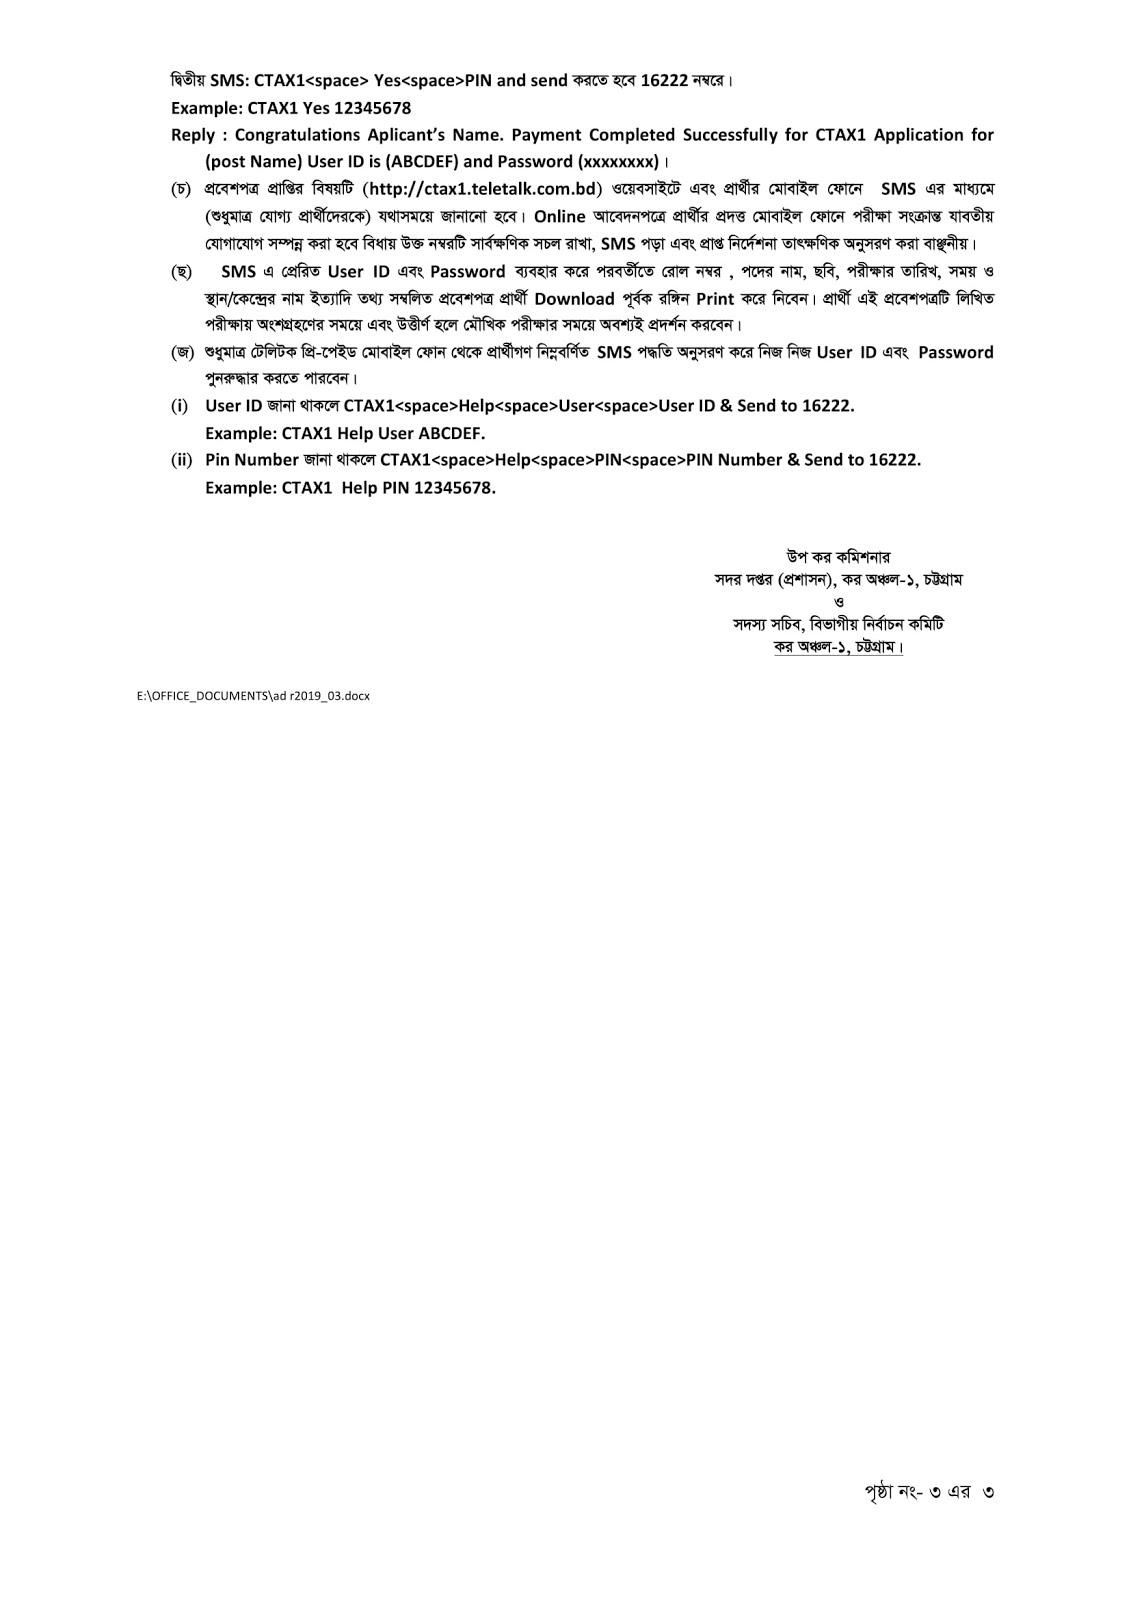 Tax commissioner office job circular 2020,income tax job circular in chittagong,chittagong income tax job circular 2020,bangladesh income tax job circular 2020,income tax job circular 2019 dhaka,tax commissioner office job circular 2019,tax commission job circular 2020,kor commission job circular 2020,tax commission job circular 2019,কর কমিশনে নিয়োগ বিজ্ঞপ্তি 2020 চট্টগ্রাম,কর কমিশন চট্টগ্রাম নিয়োগ,কর কমিশনারের কার্যালয়,কর অঞ্চল ১৩ নিয়োগ বিজ্ঞপ্তি ২০১৯,কর কমিশনারের কার্যালয়ে নিয়োগ বিজ্ঞপ্তি ,কর কমিশনারের কার্যালয় চট্টগ্রাম,কর কমিশনারের কার্যালয় ঢাকা নিয়োগ বিজ্ঞপ্তি,কর অঞ্চল ৩ চট্টগ্রাম নিয়োগ বিজ্ঞপ্তি,income tax job circular in chittagong,chittagong income tax job circular 2019,bangladesh income tax job circular 2019,income tax job circular 2019 dhaka,tax commissioner office job circular 2019,tax commission job circular 2019,kor commission job circular 2019,tax commission job circular 2018,